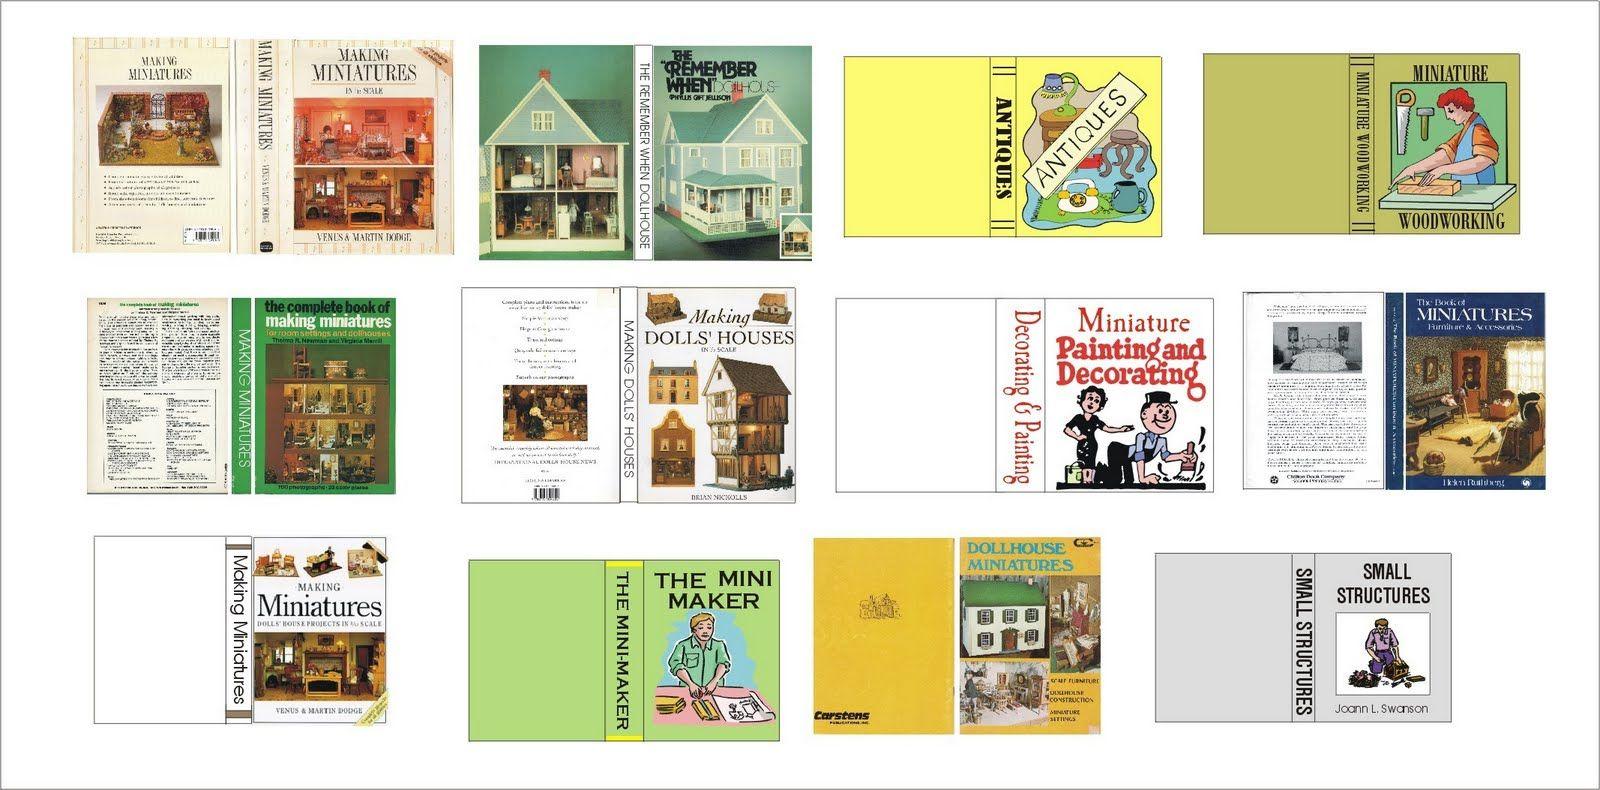 book+covers.jpg (1600×790)